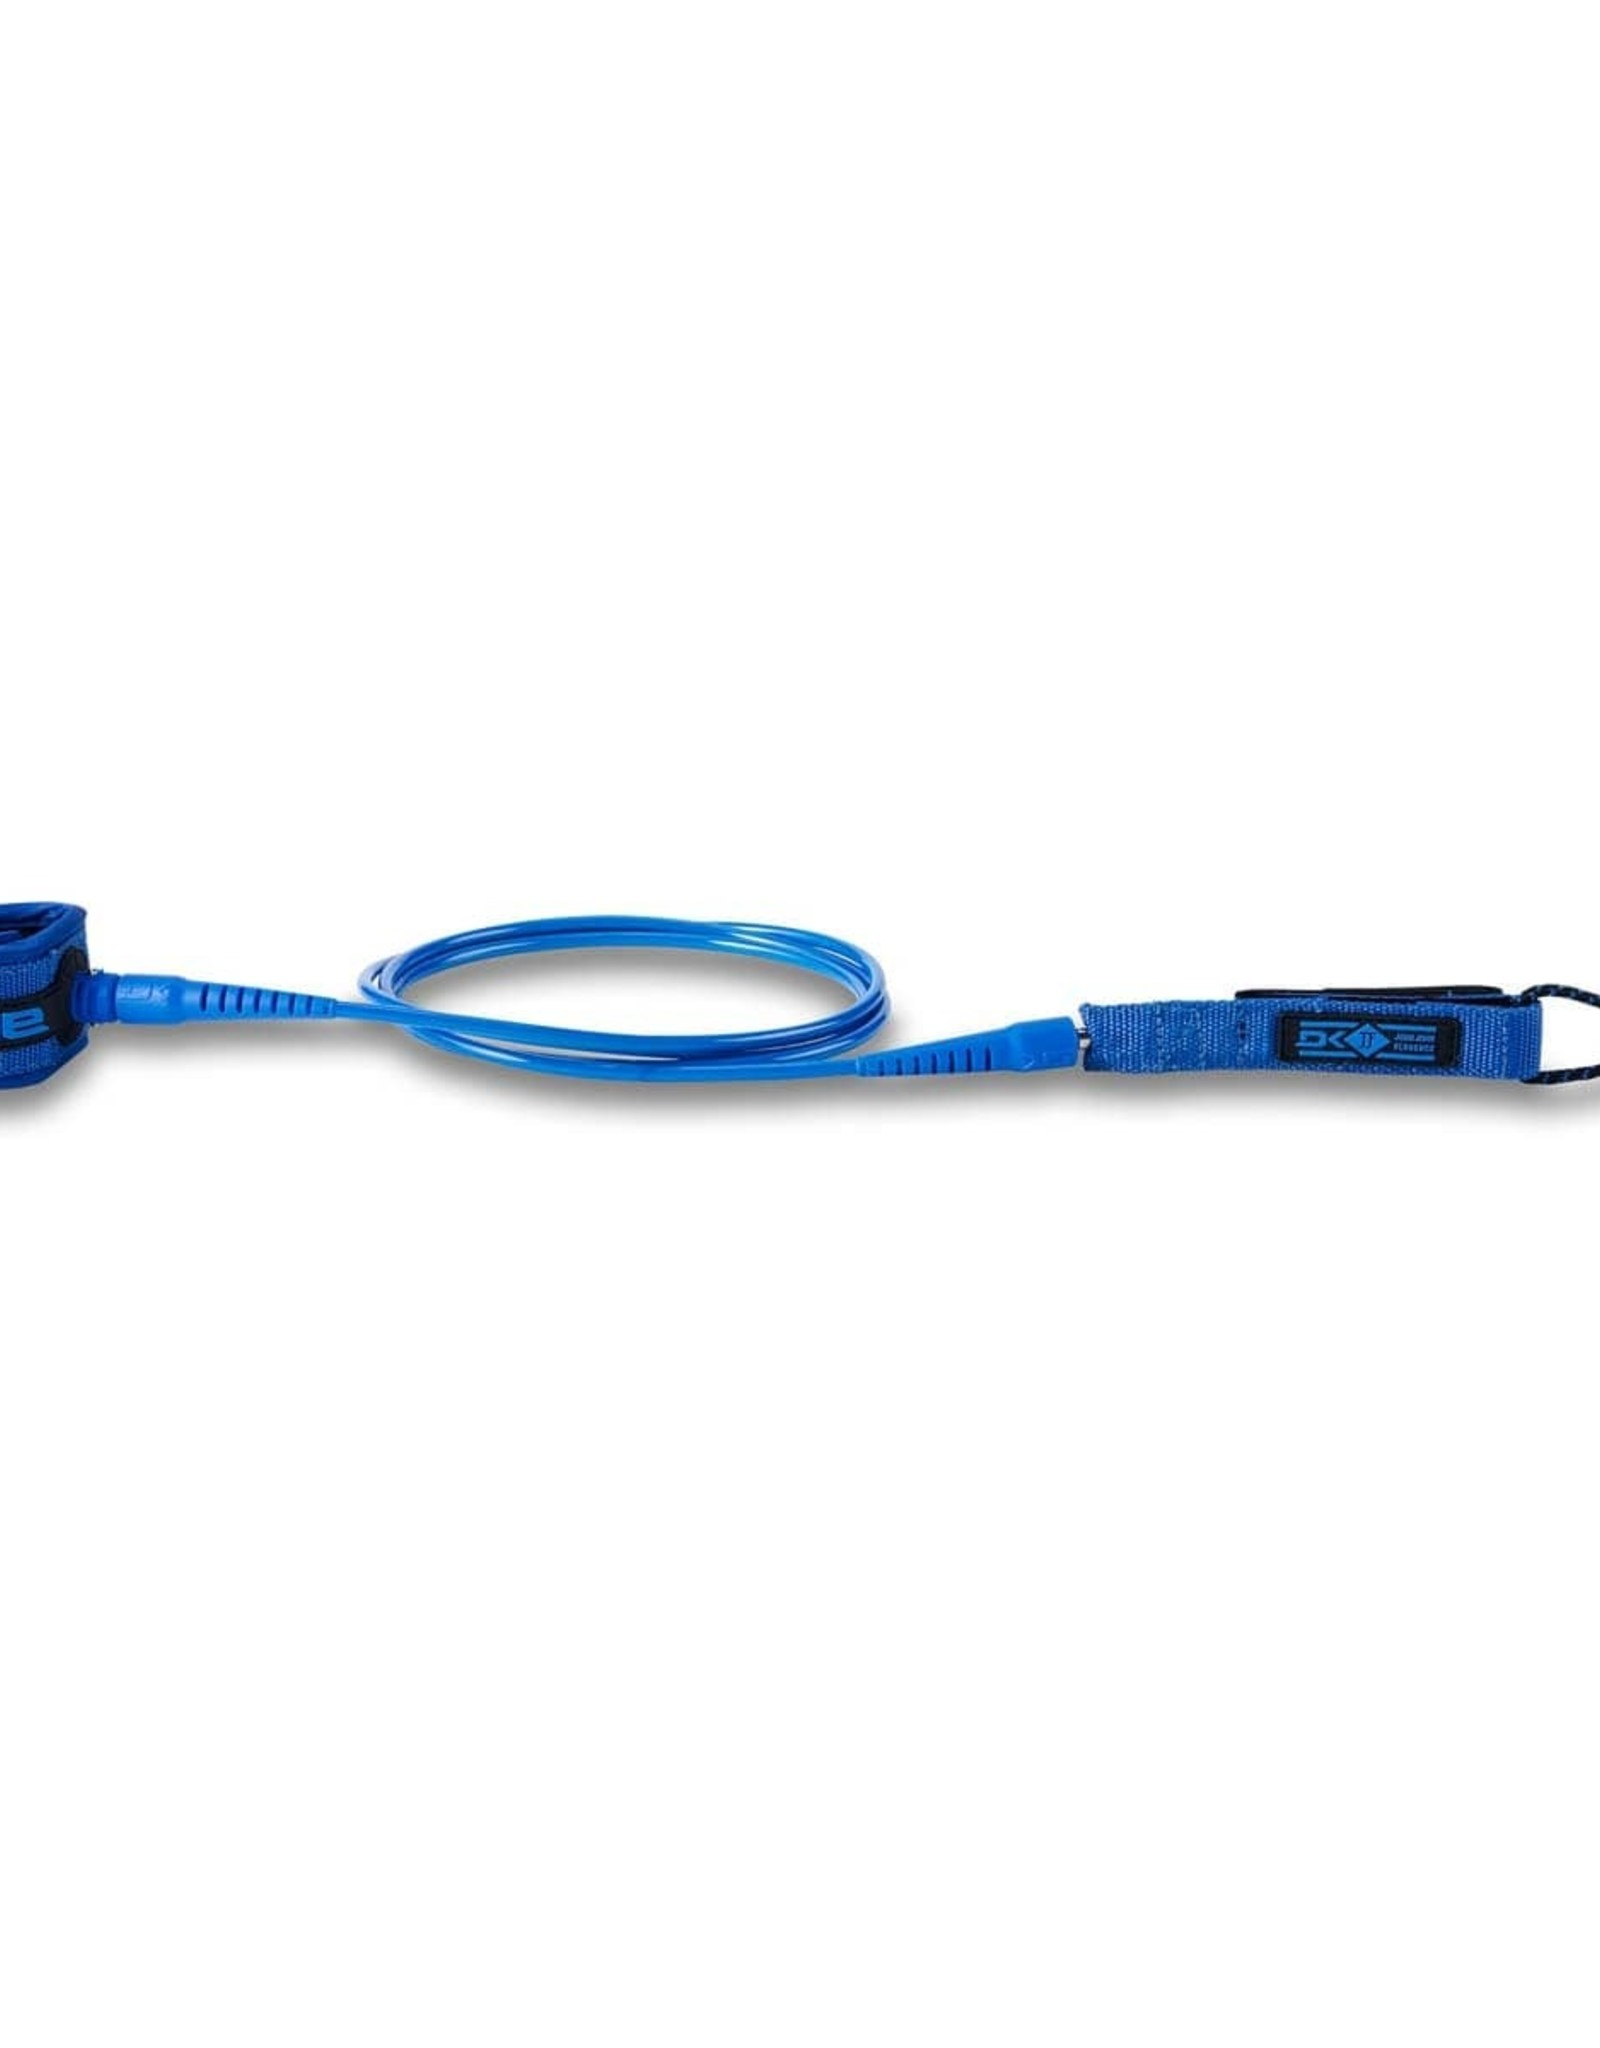 Dakine DAKINE JJF KAINUI 7FT X  1/4IN BLUE